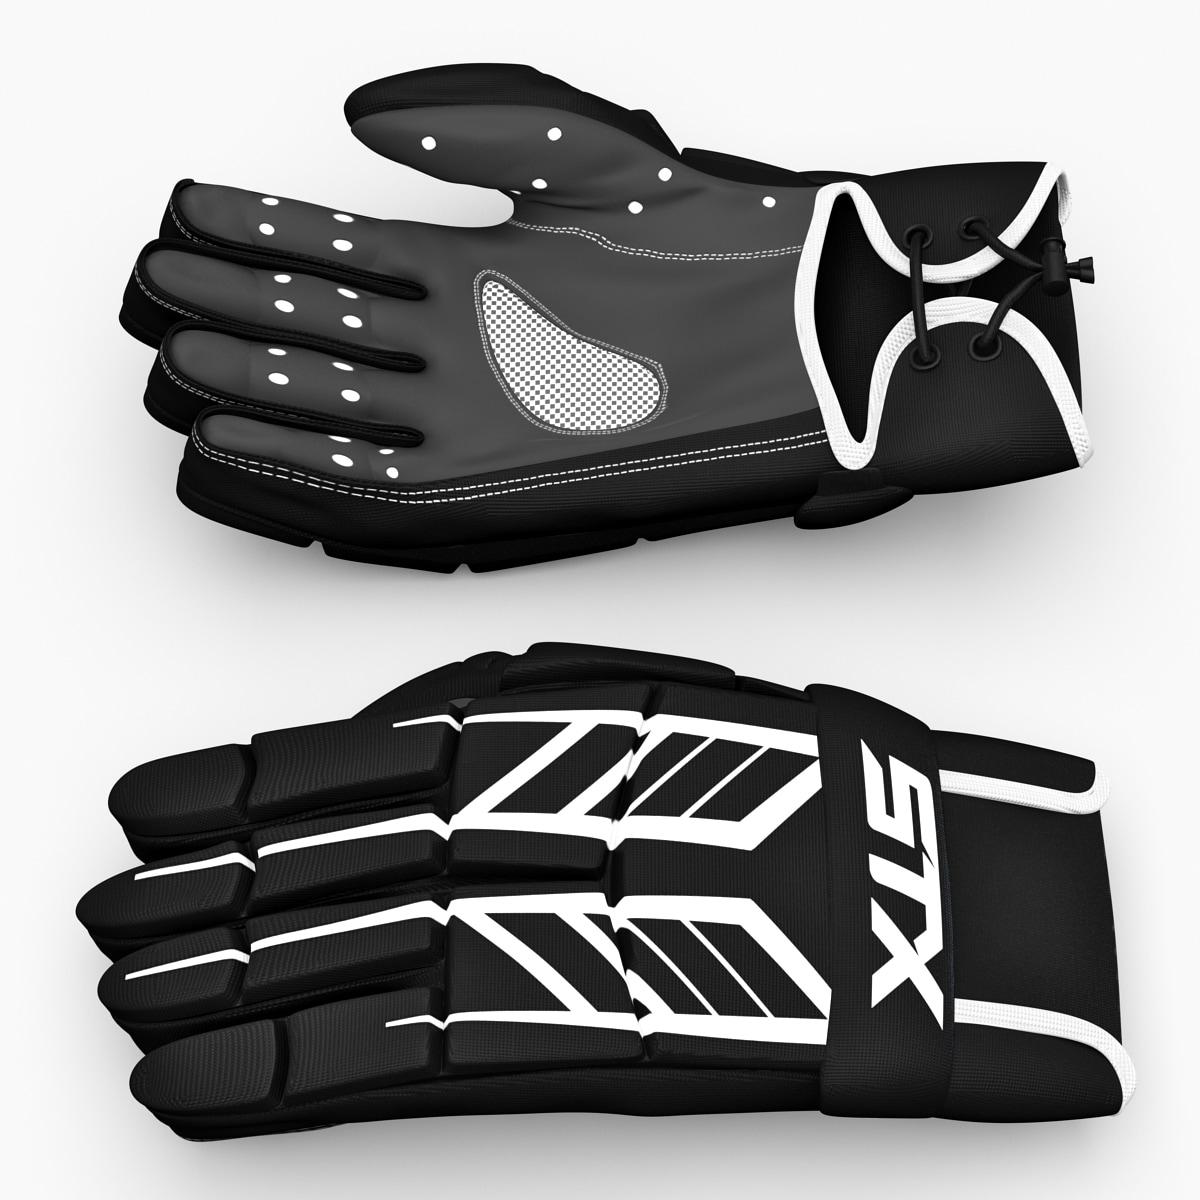 3ds max stx stinger lacrosse gloves